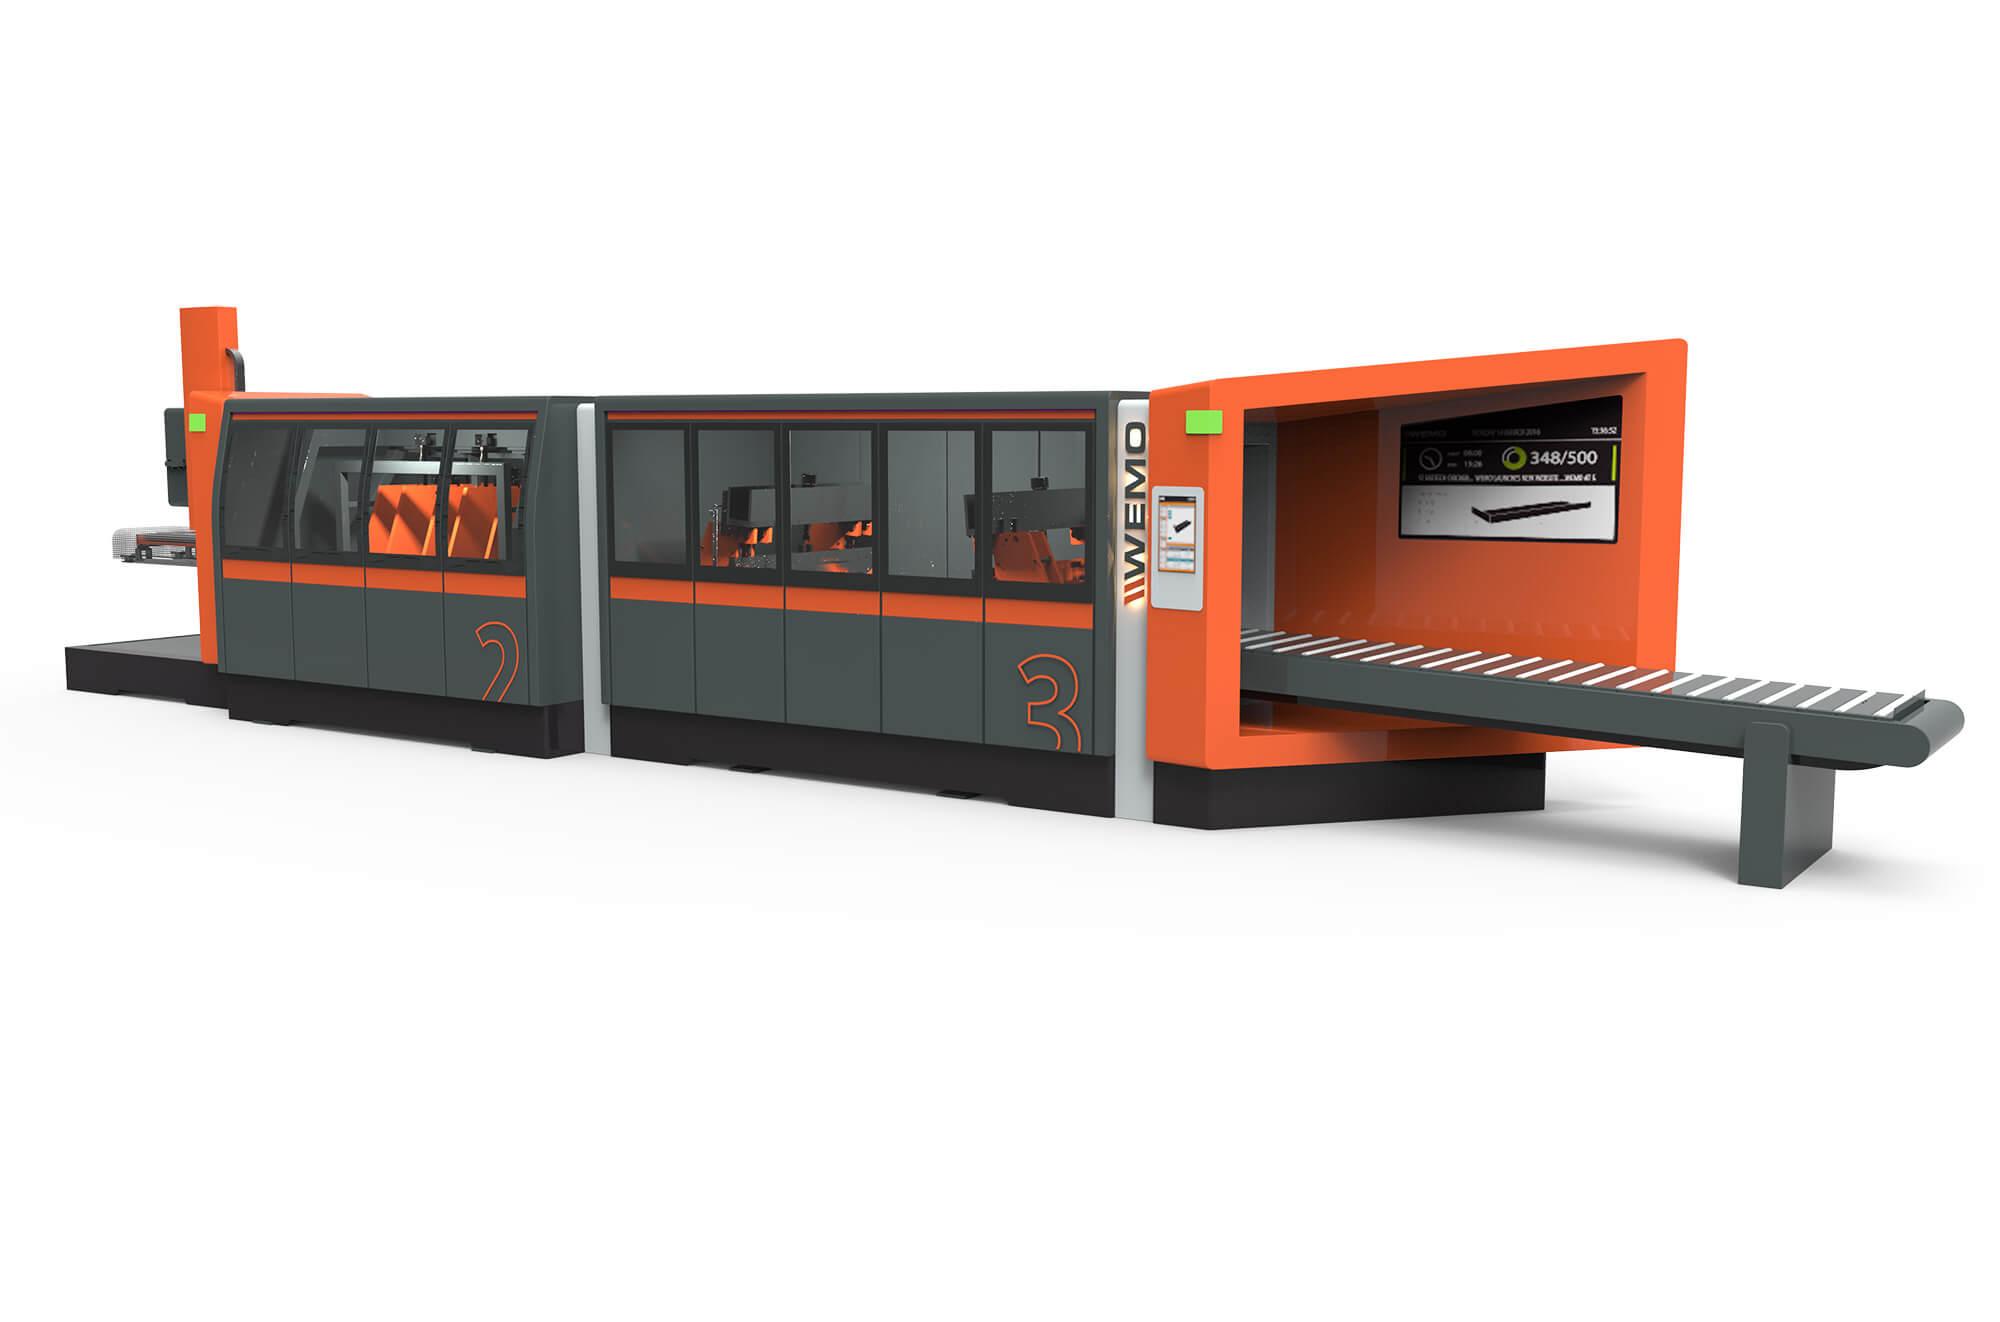 Nieuwe WEMO machine design lancering